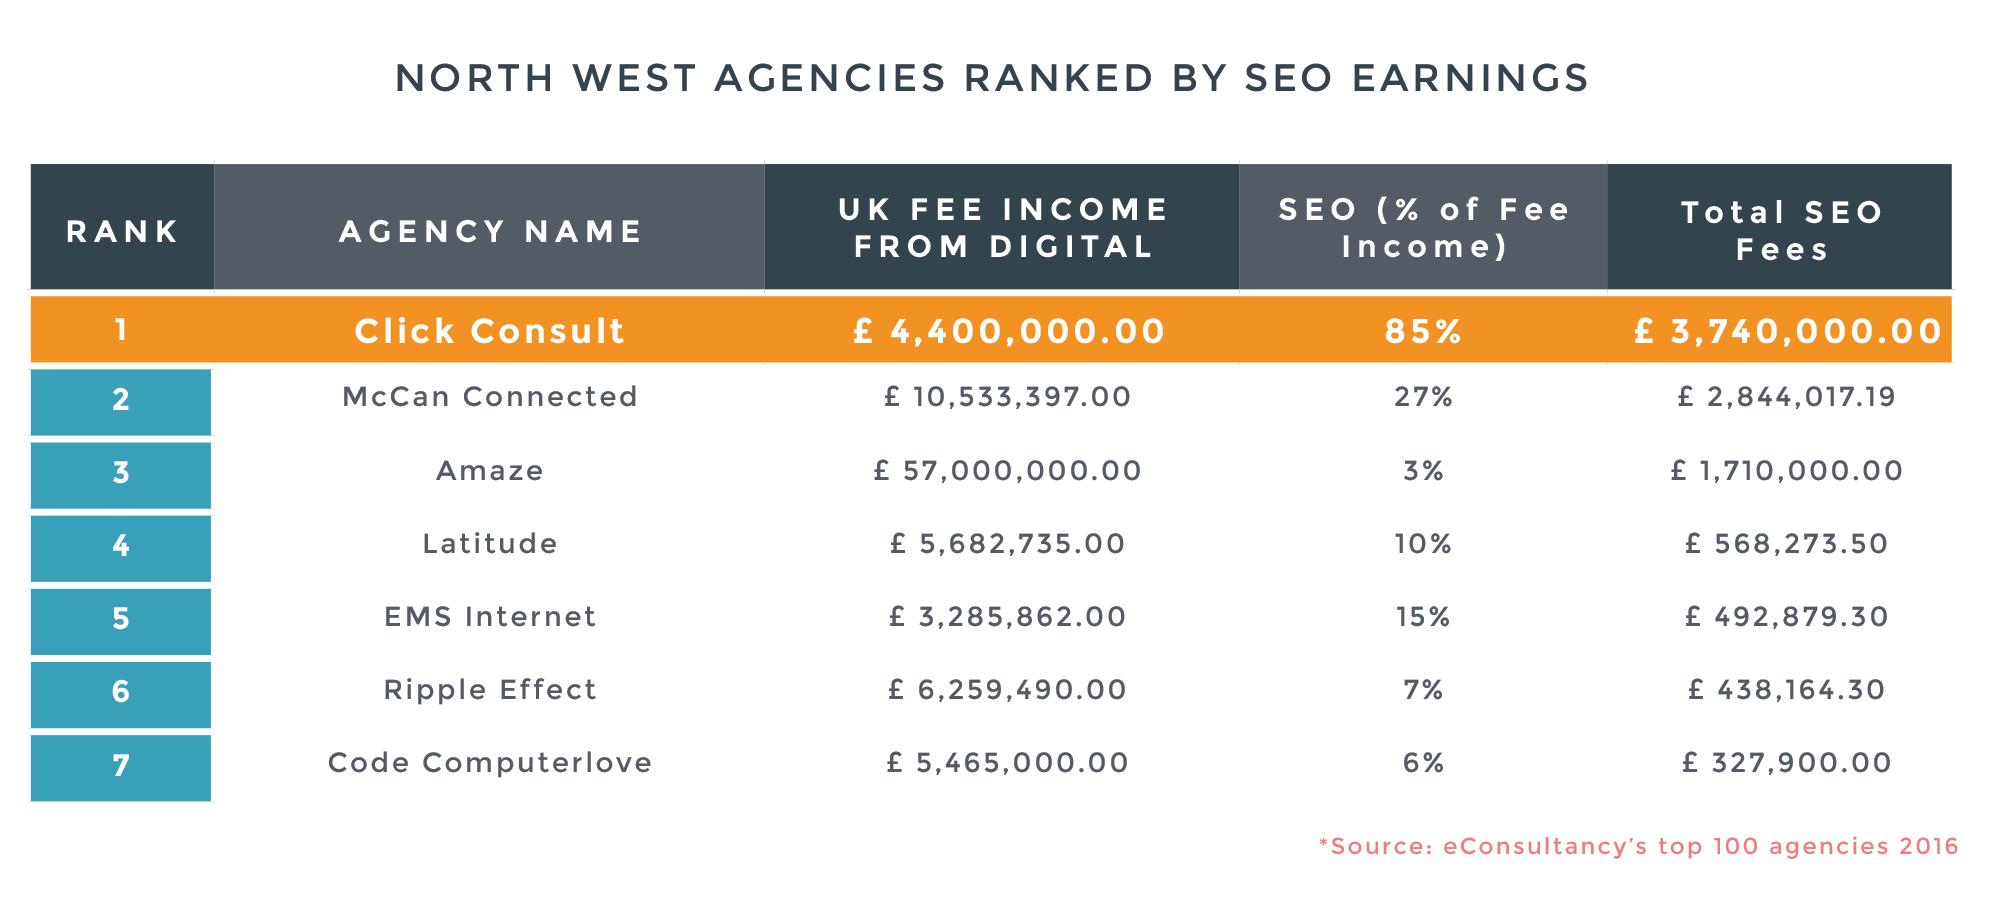 North West Agencies Ranking